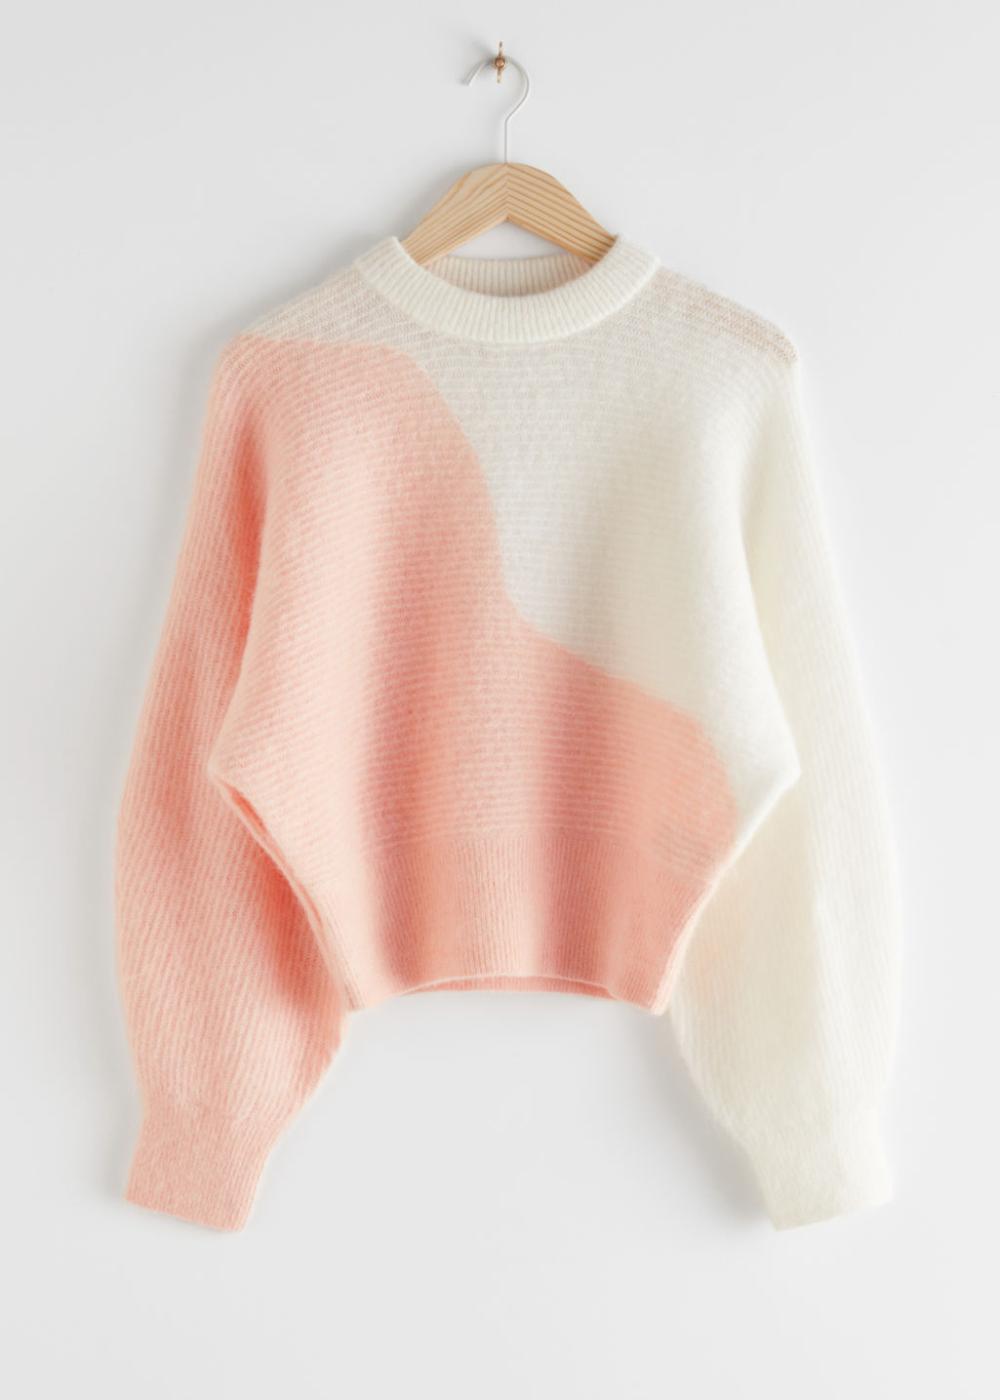 Colour Block Wave Sweater In 2020 Wave Sweater Sweaters Knitwear